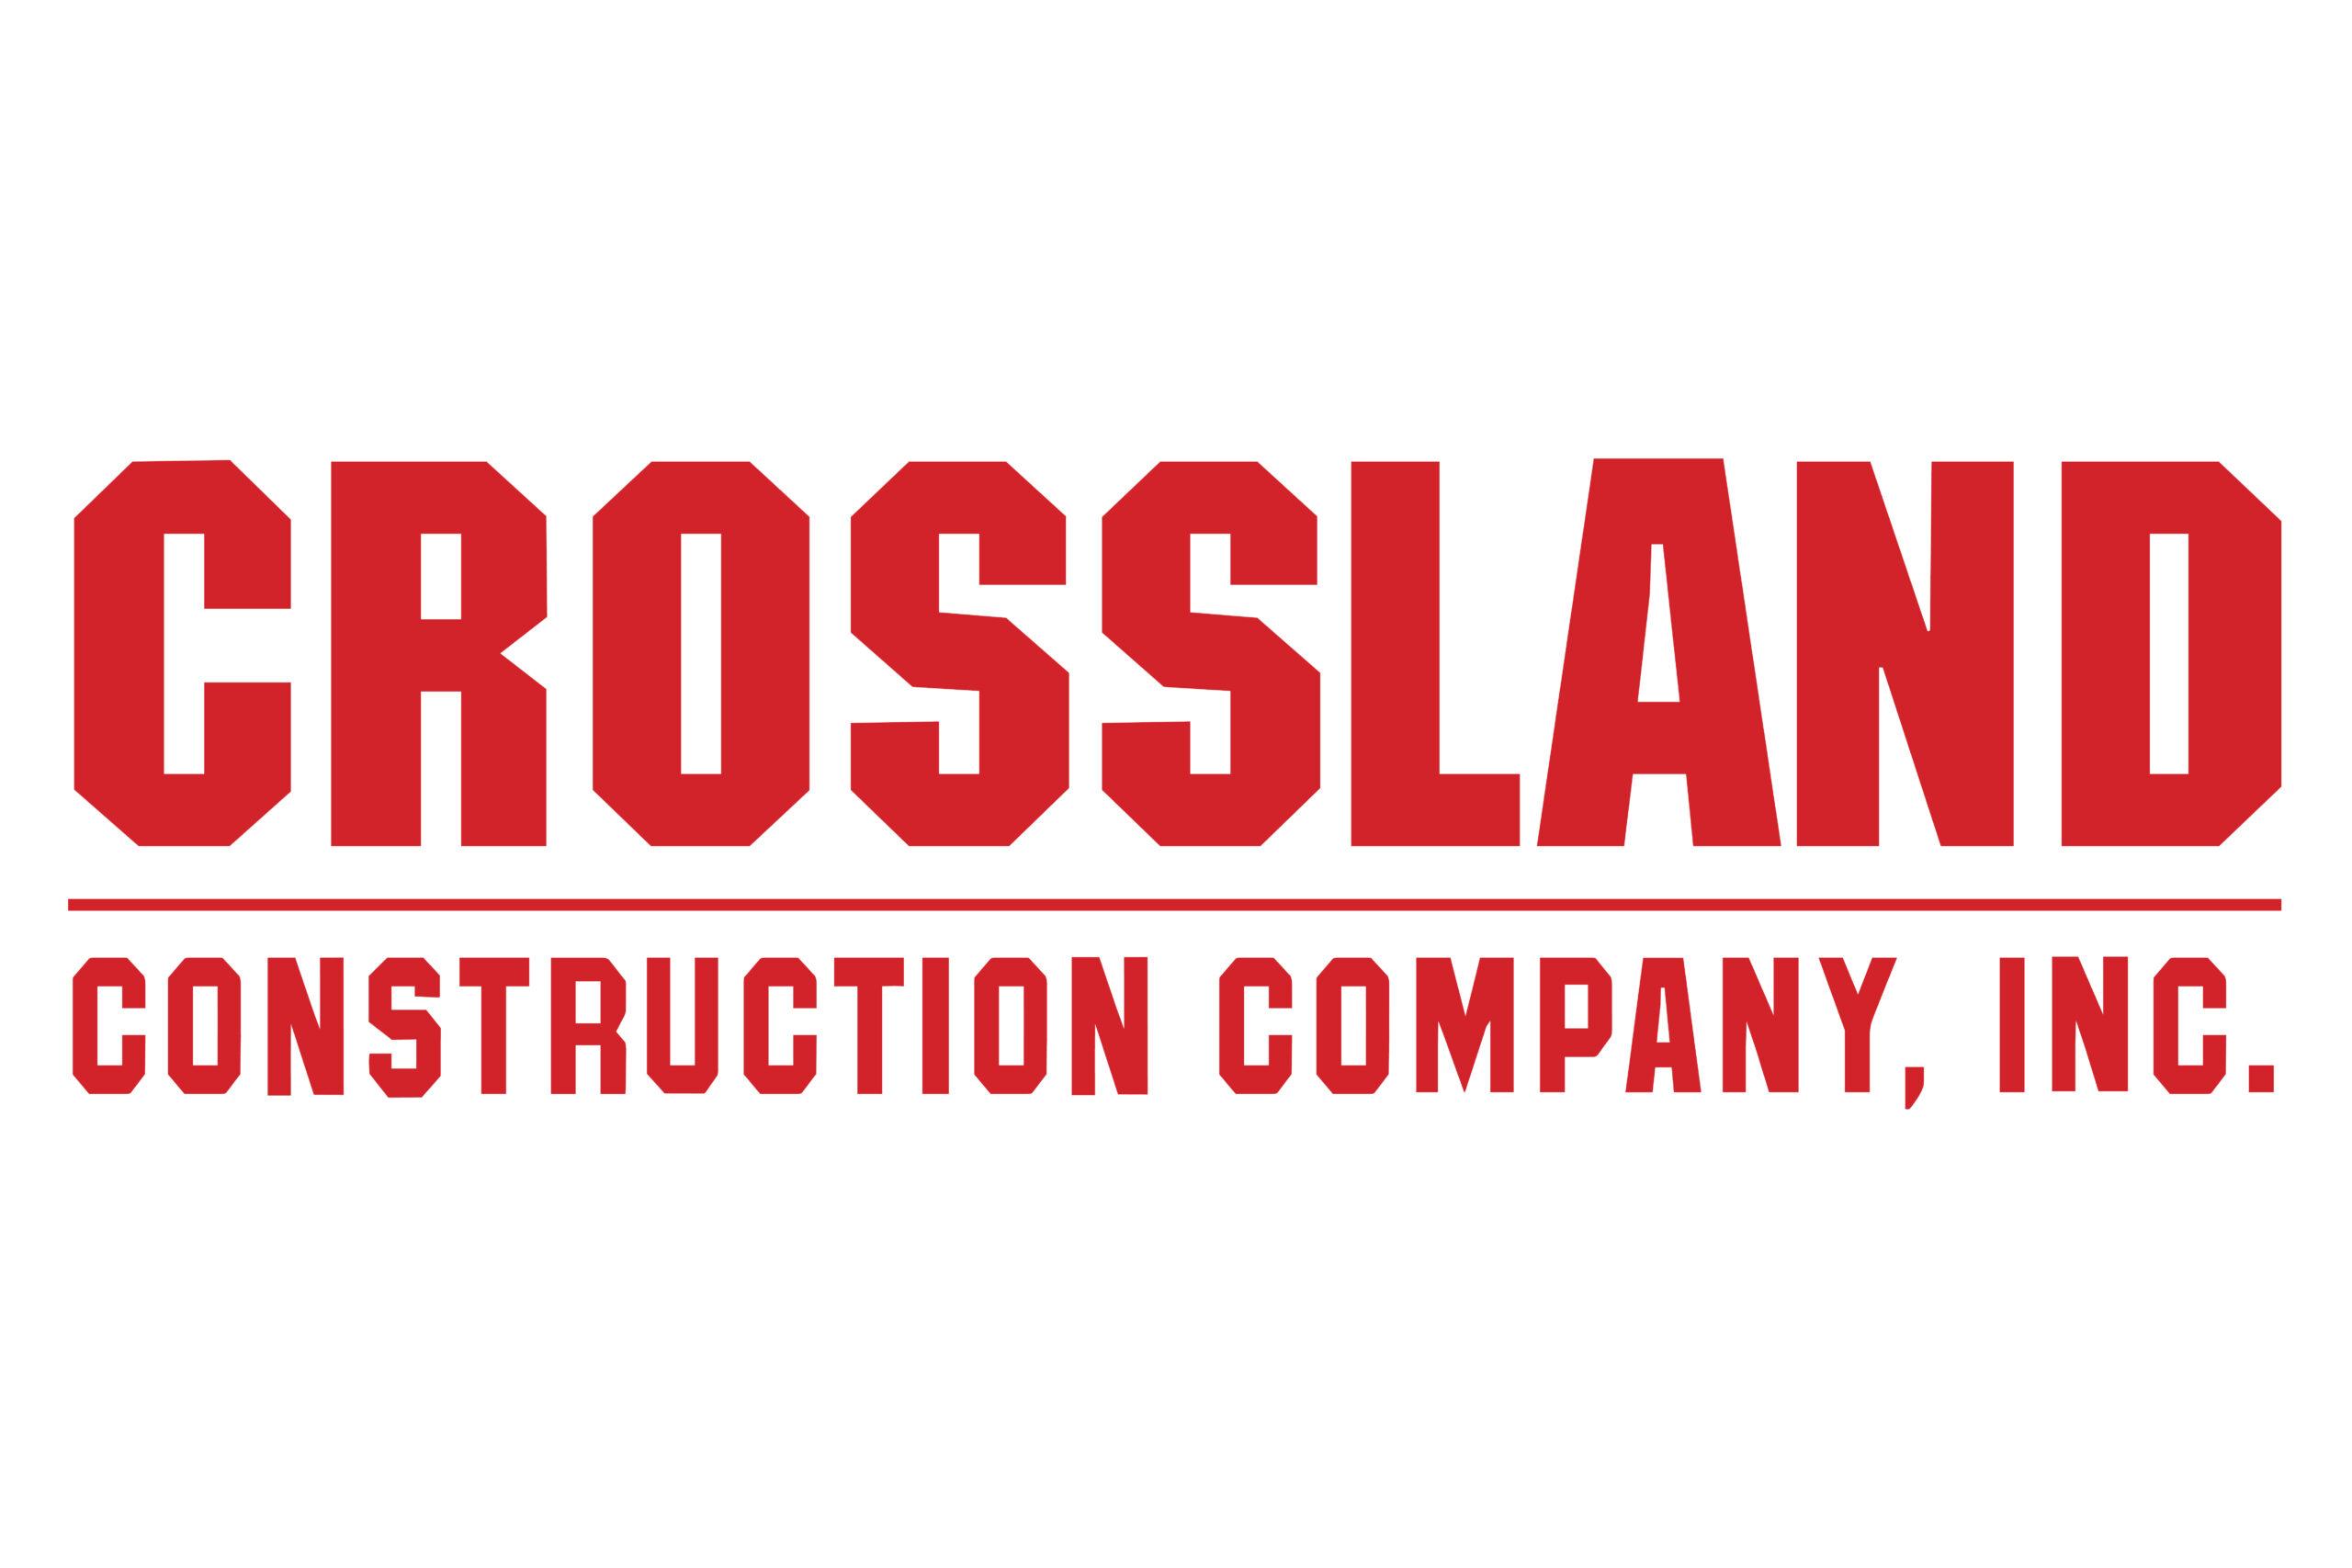 Crossland Construction Co., Inc